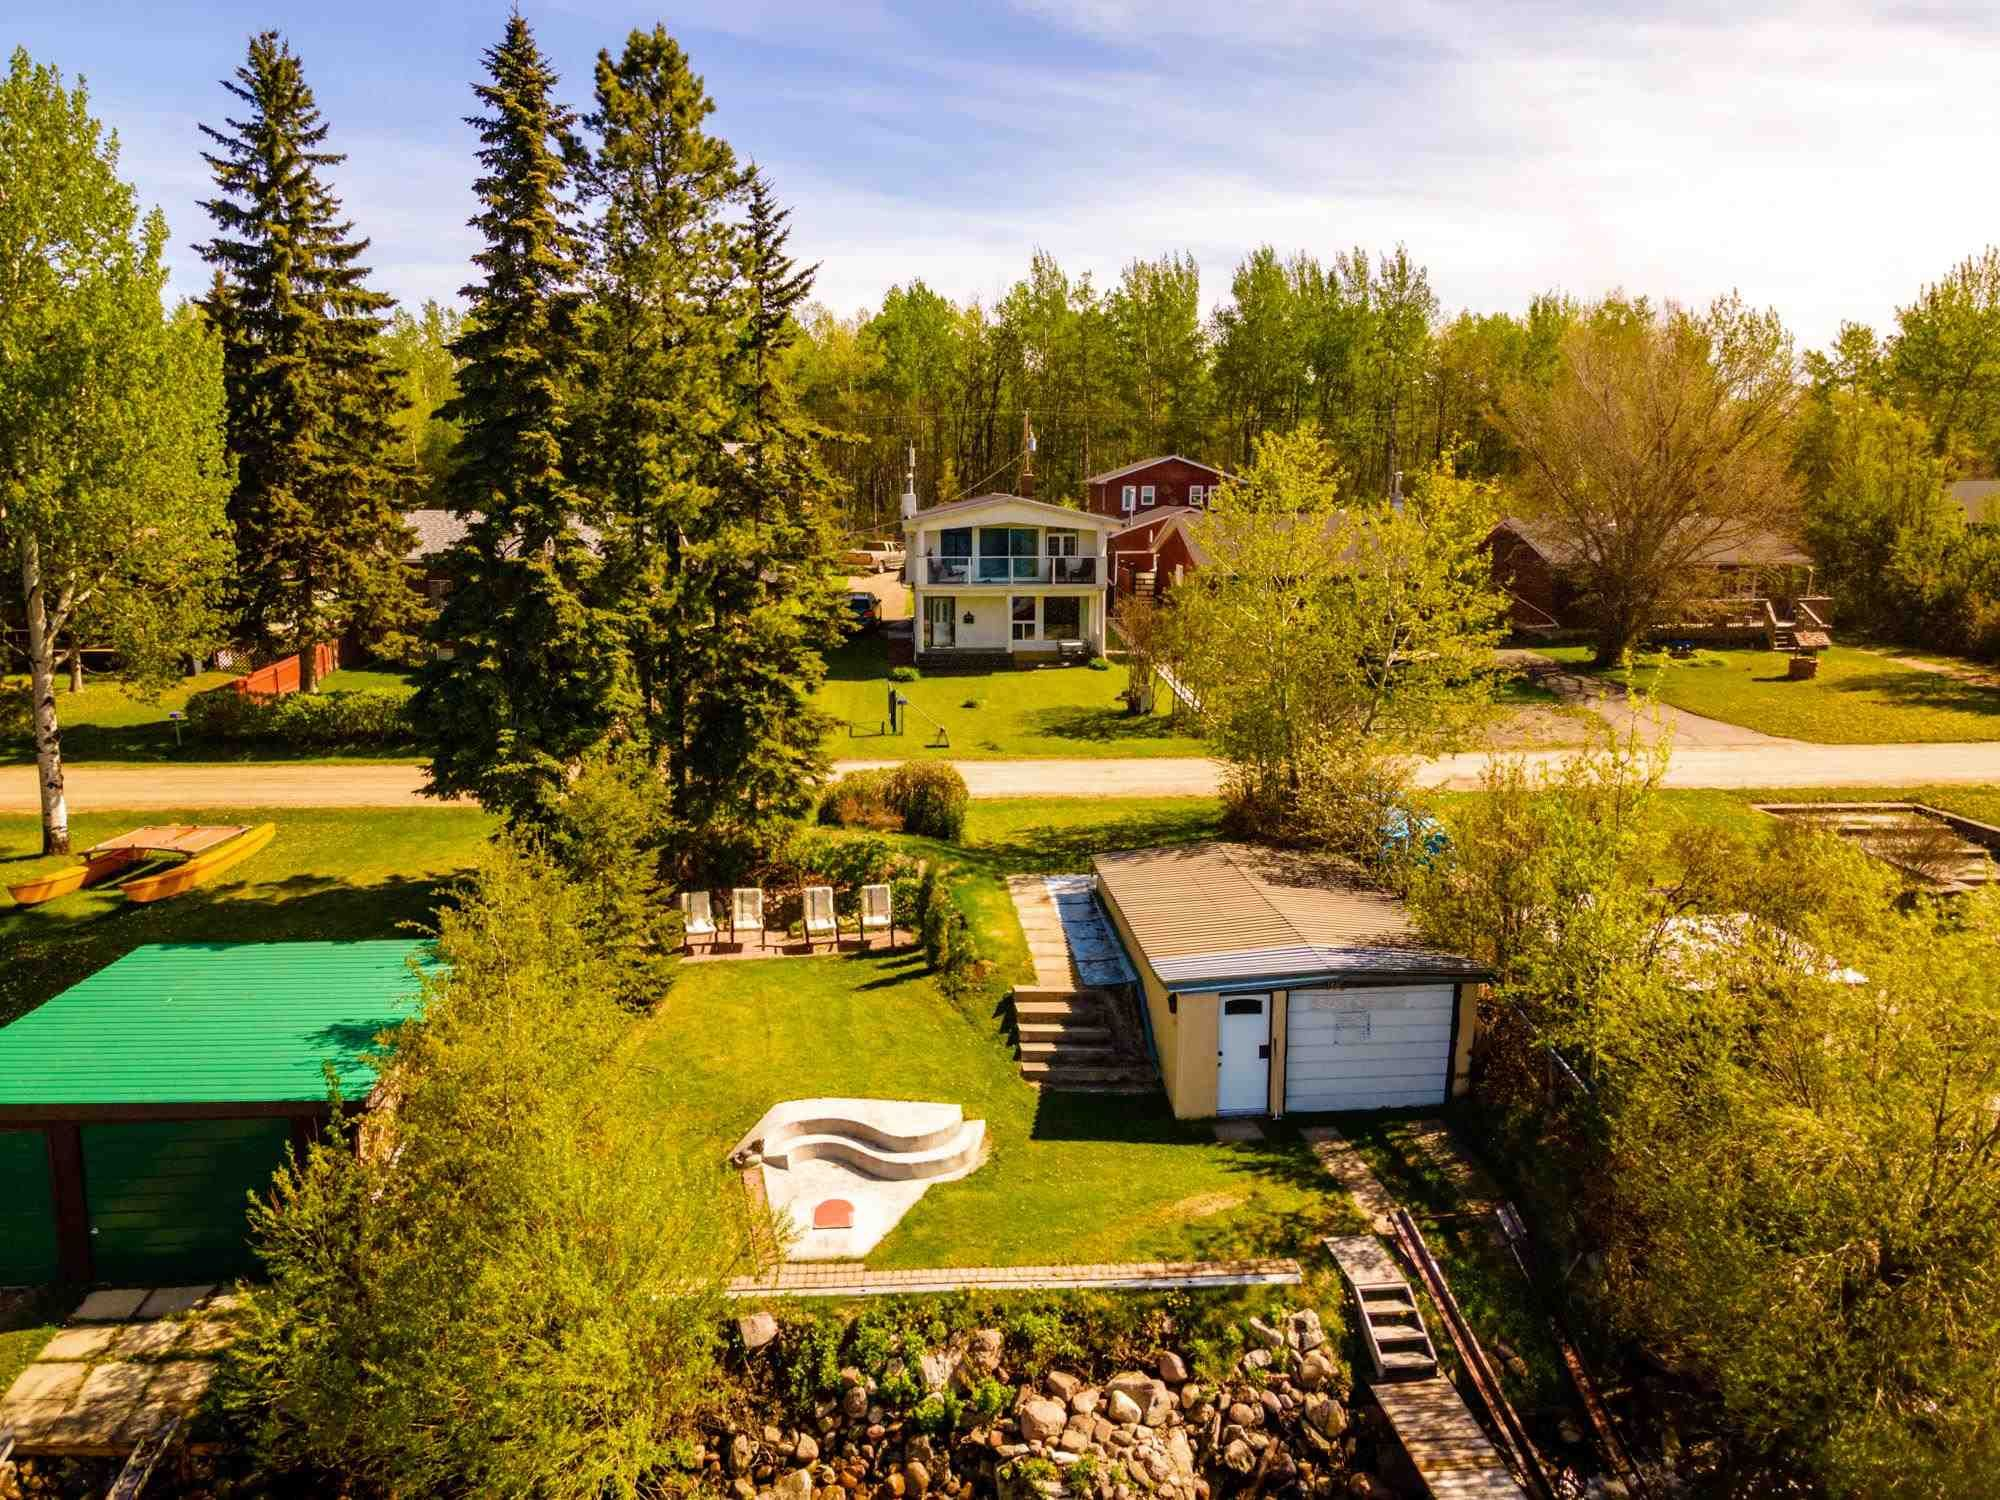 Main Photo: 106 Lakeshore Drive: Rural Leduc County House for sale : MLS®# E4244739